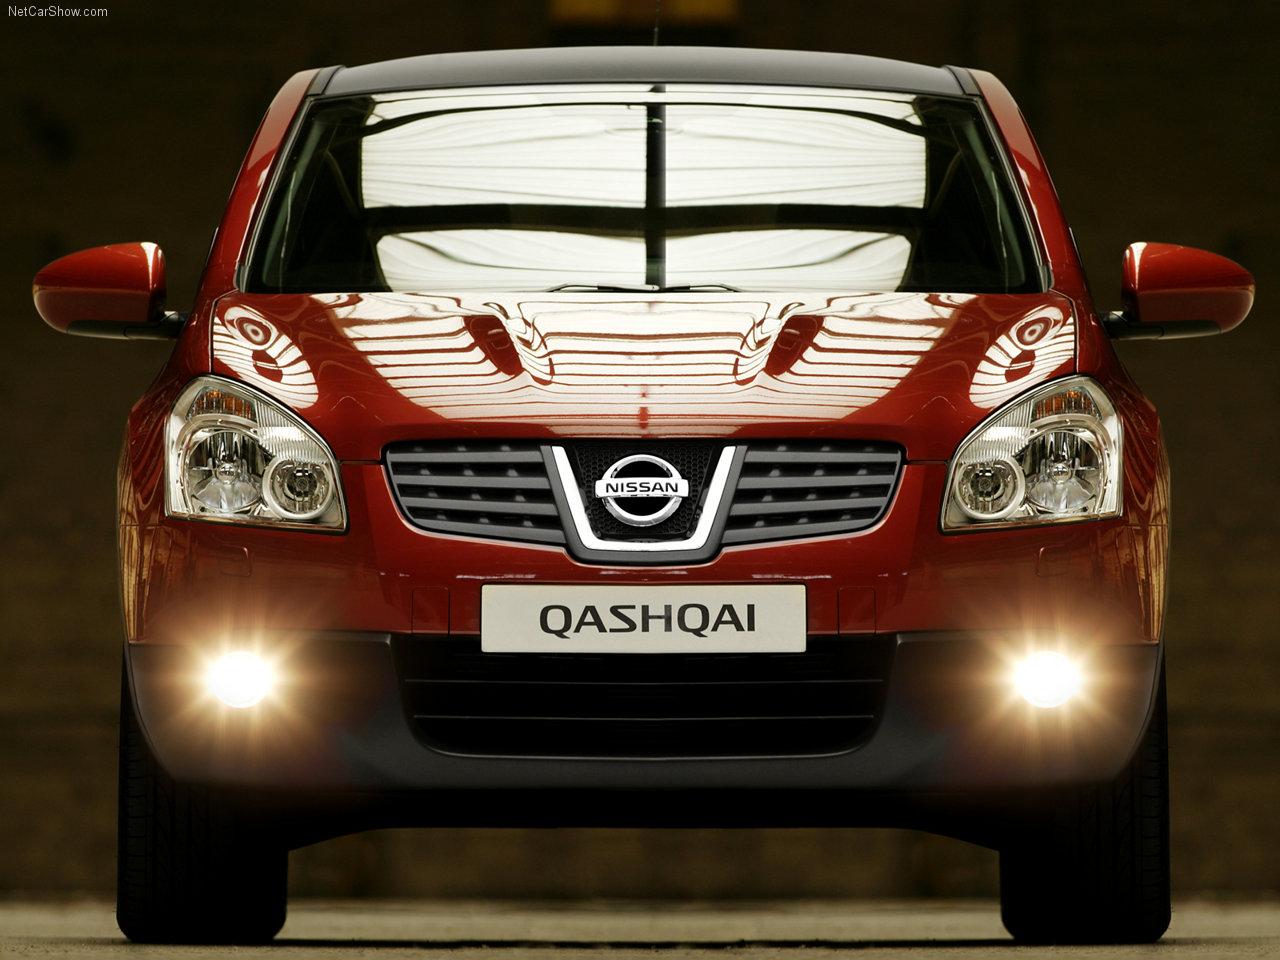 Nissan Qashqai A K A Nissan Dualis Model J10 Series Workshop Service Repair Manual